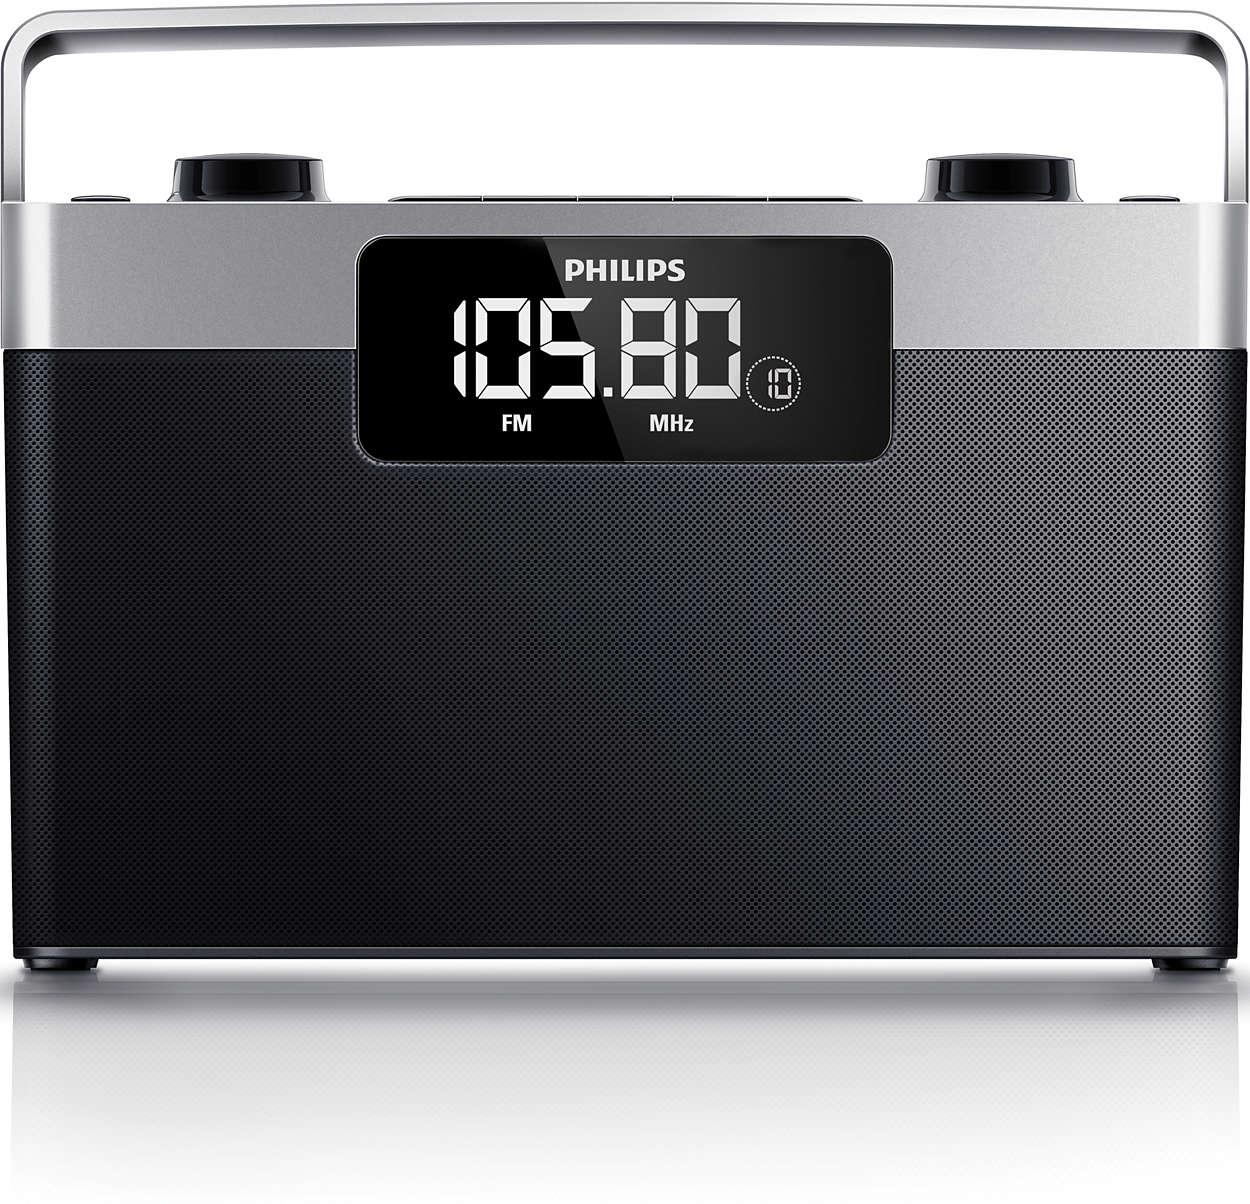 radio portable ae2430 12 philips. Black Bedroom Furniture Sets. Home Design Ideas